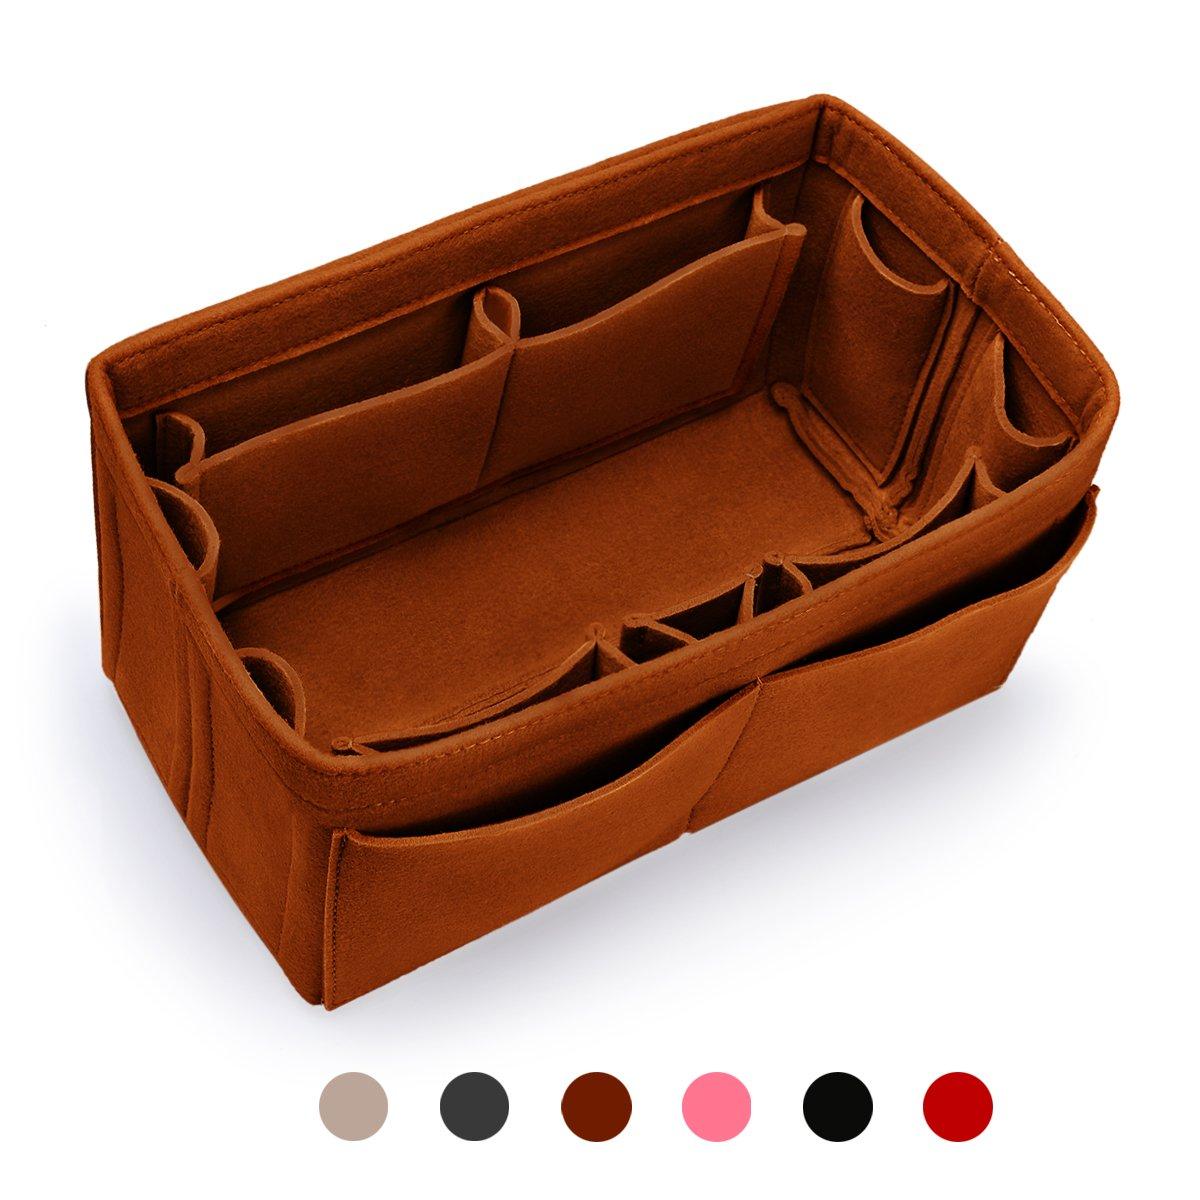 MakeUper Felt Purse Insert Organizer, Handbag Organizer, Bag in Bag, 12 Compartments (Large, Brown)